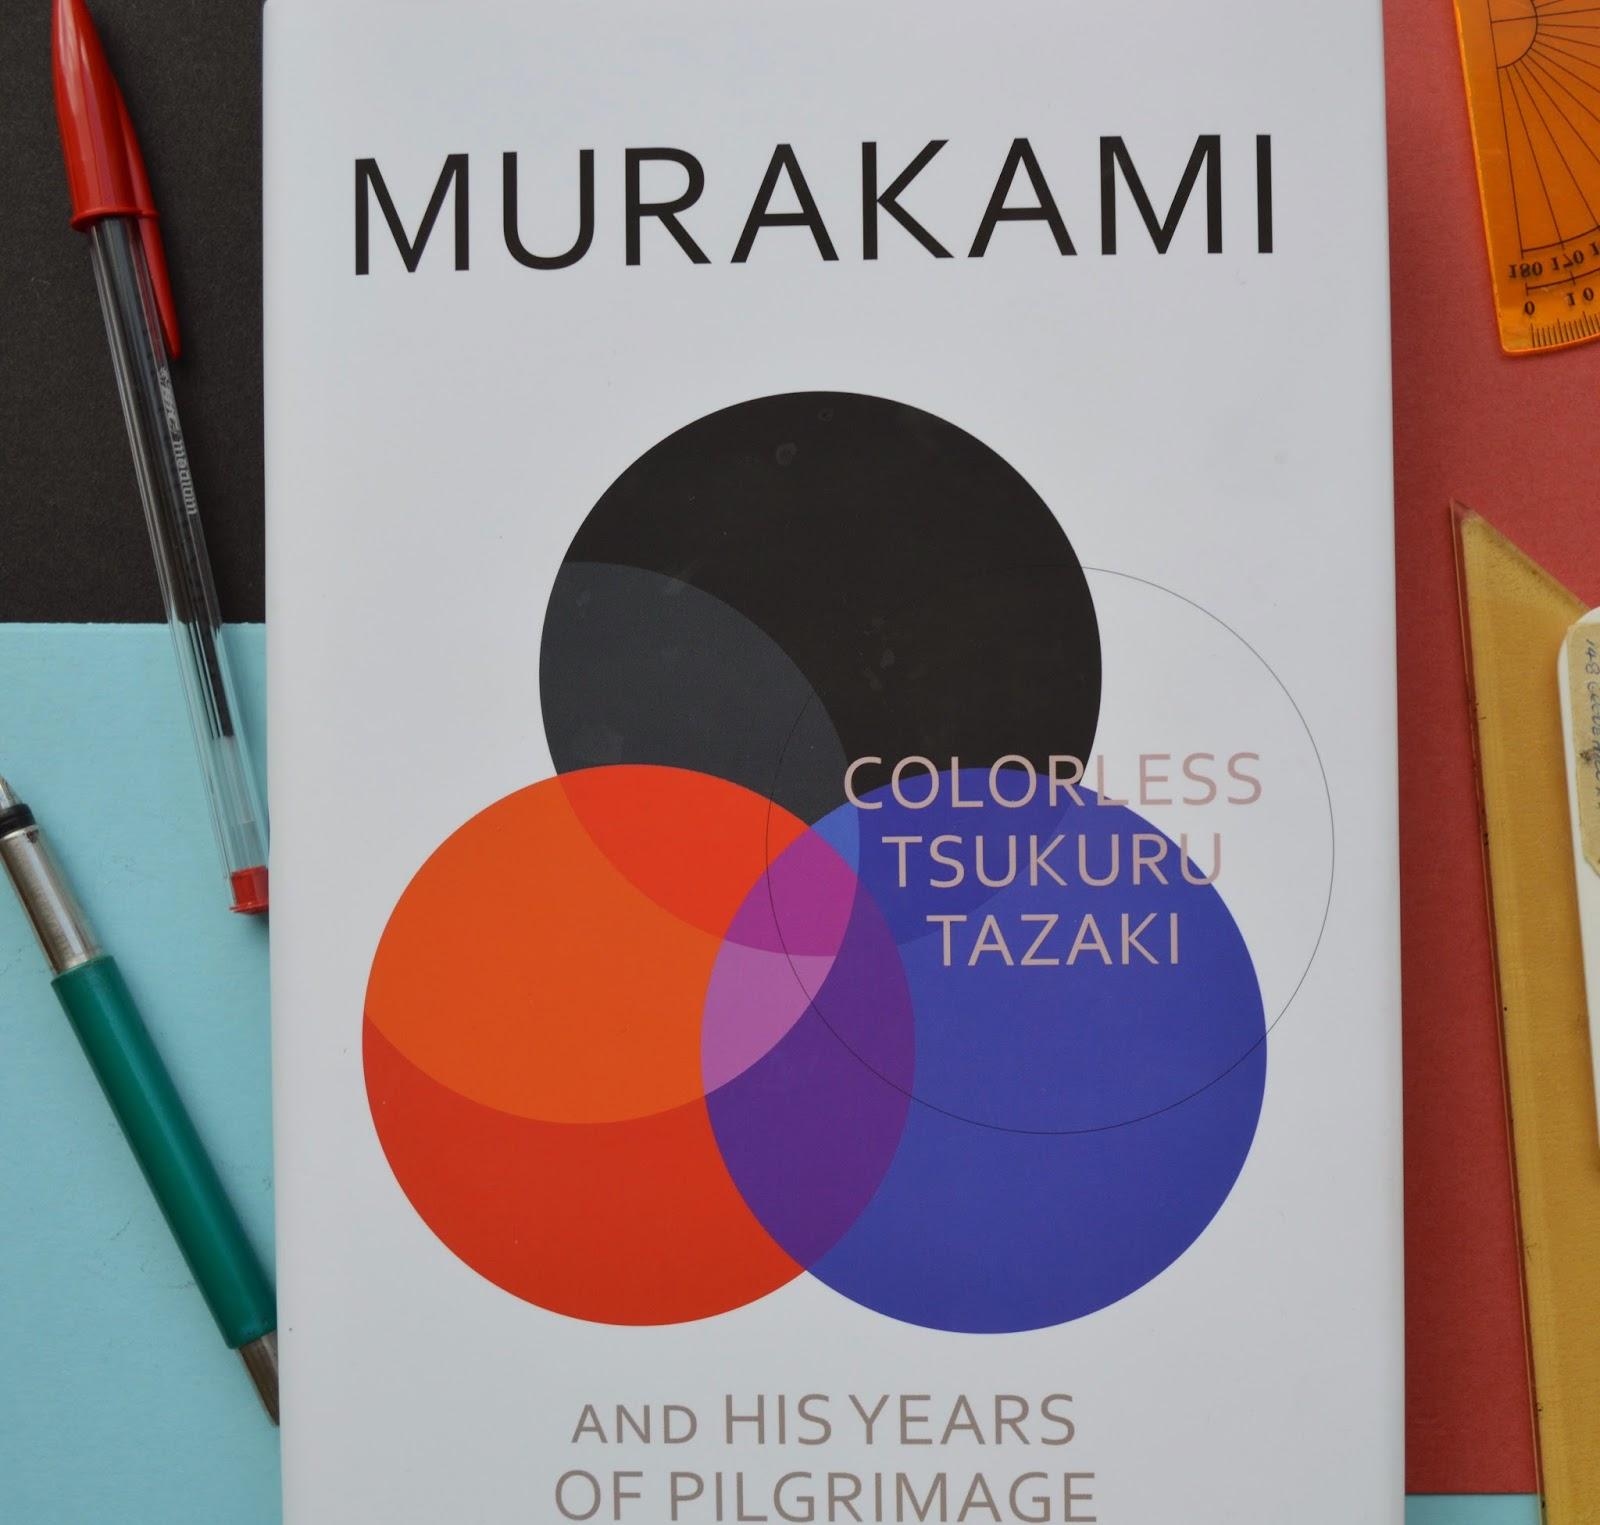 Haruki Murakami, Colorless Tsukri Tazaki and His Years of Pilgrimage, review, book, hardback, design, UK edition, Japanese literature, spoilers, photo, picture, photograph,